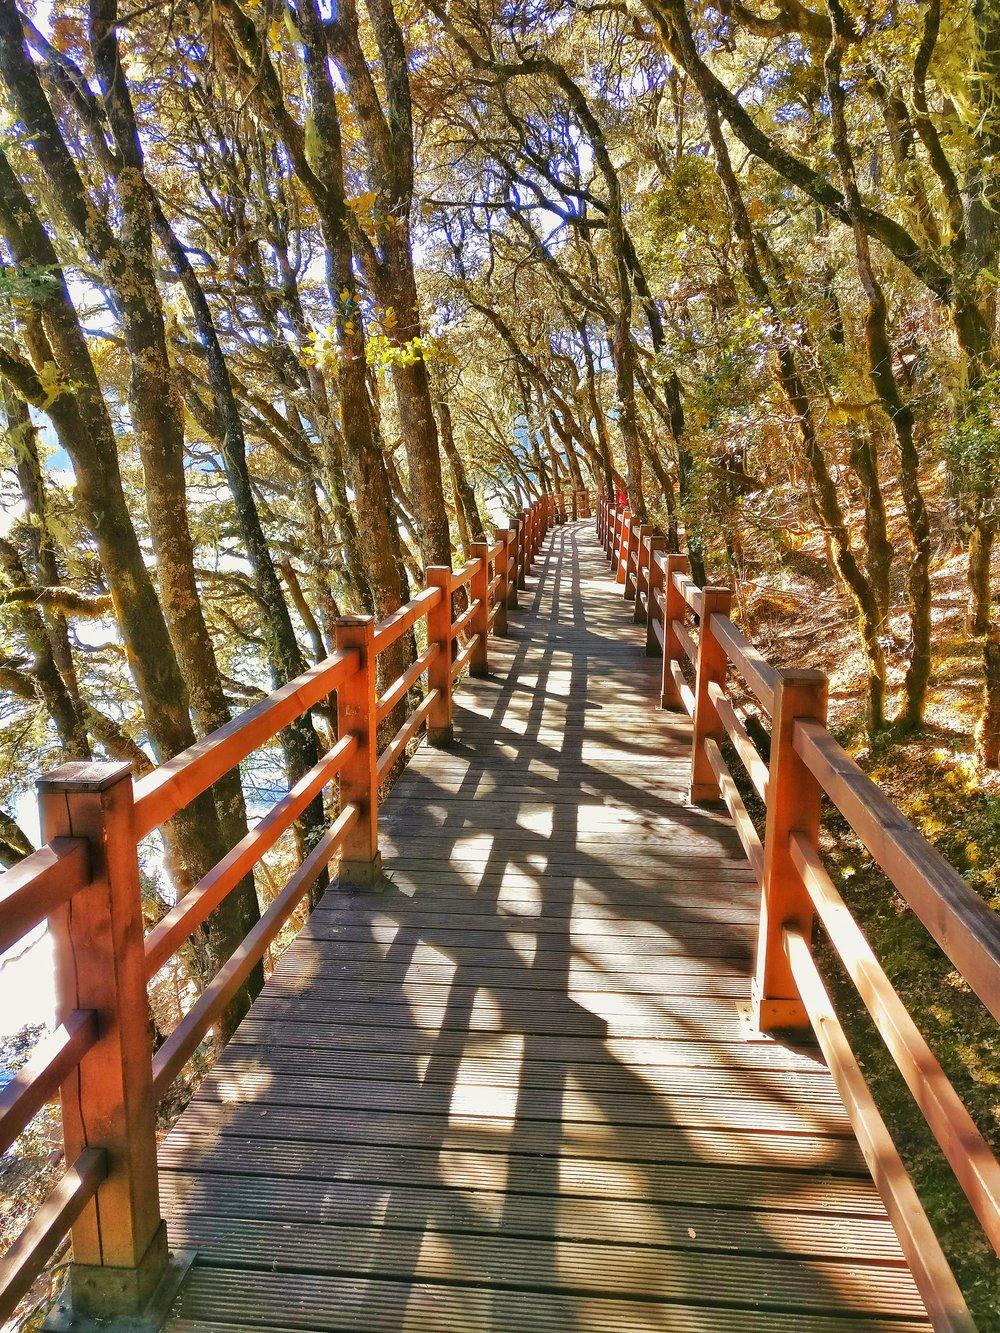 bitalake-potatsonationalpark-yunnan-world-heritage-site